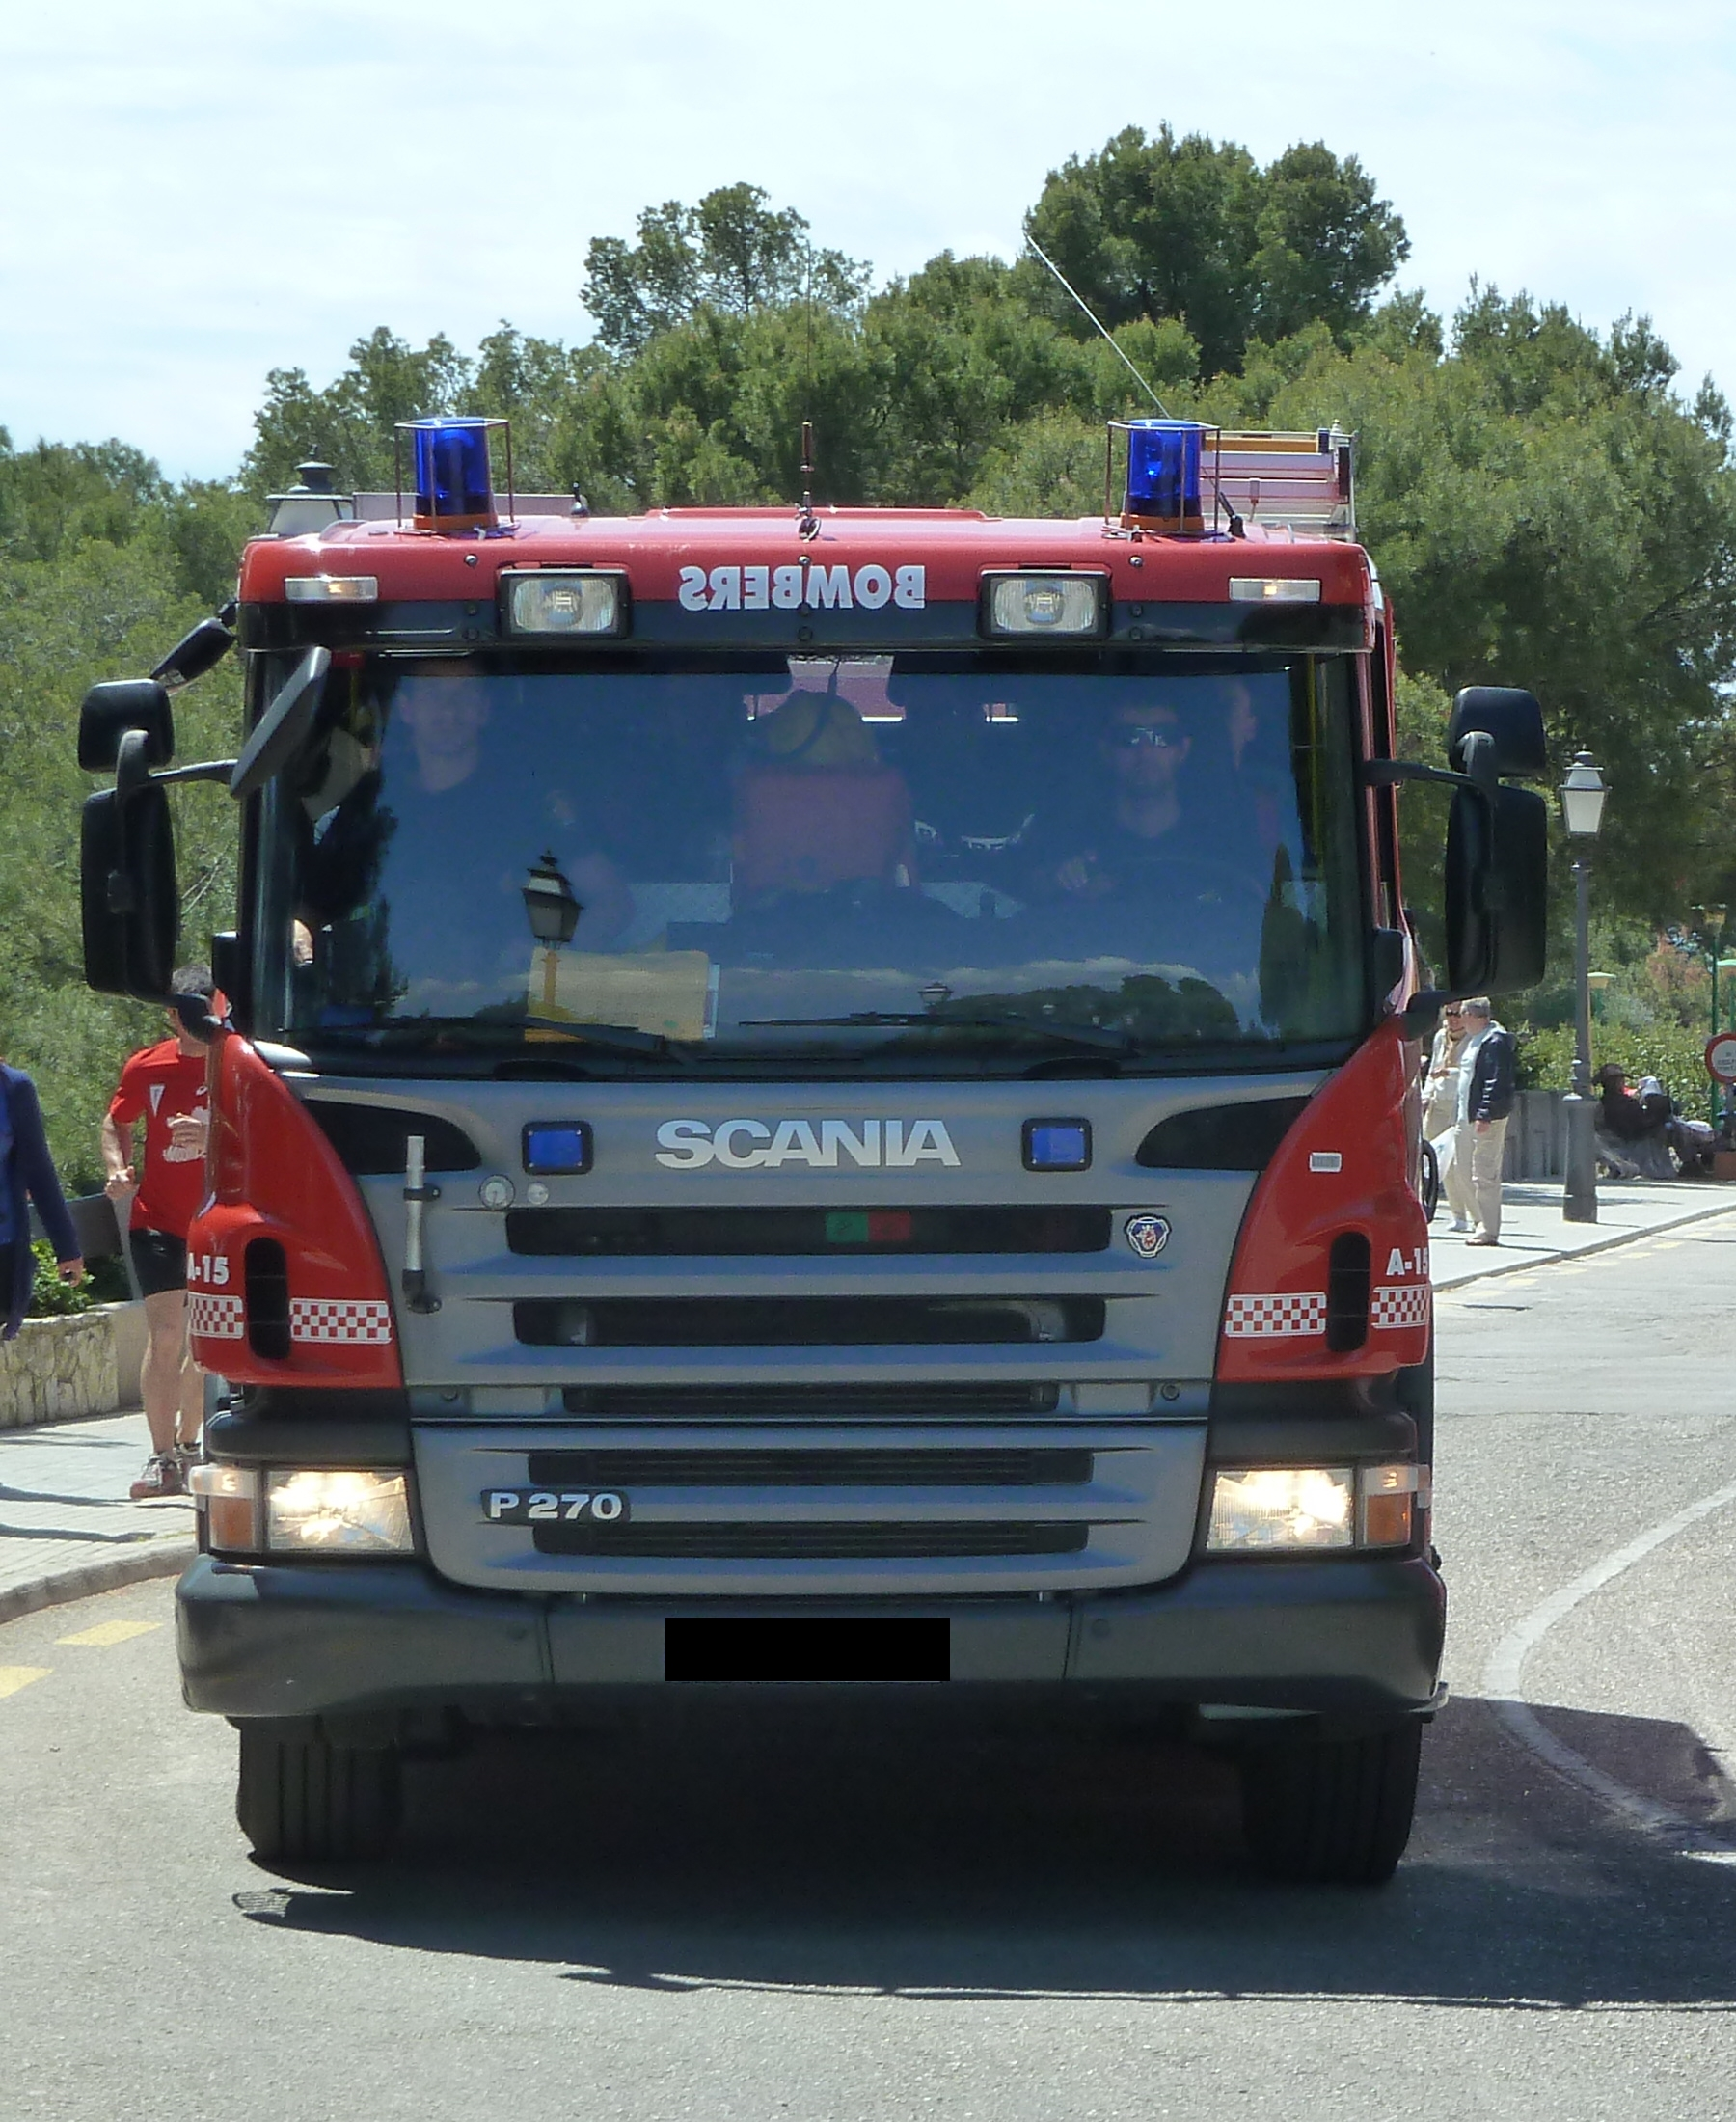 Einsatzfahrzeug der Bomberos de Palma de Mallorca